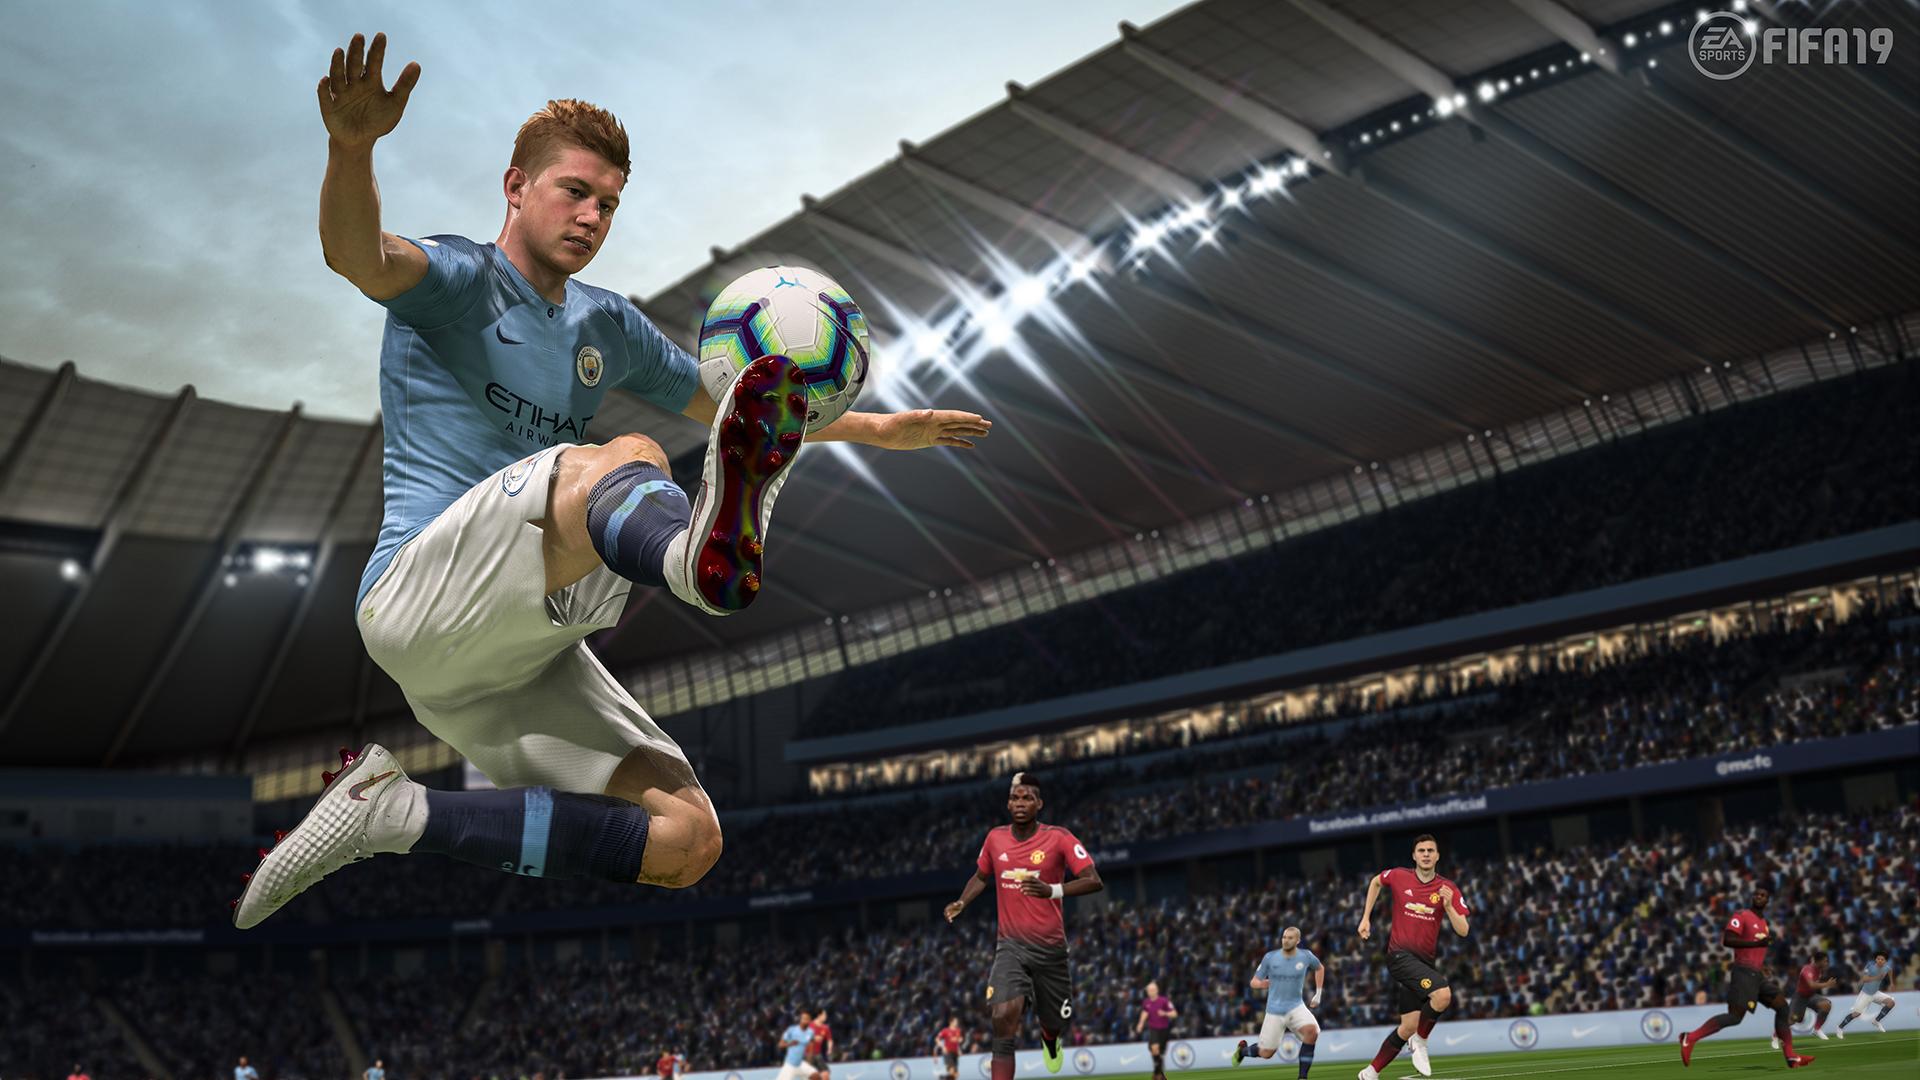 FIFA 20: release date, news, dTRCqvkf4JaX42swYcJw